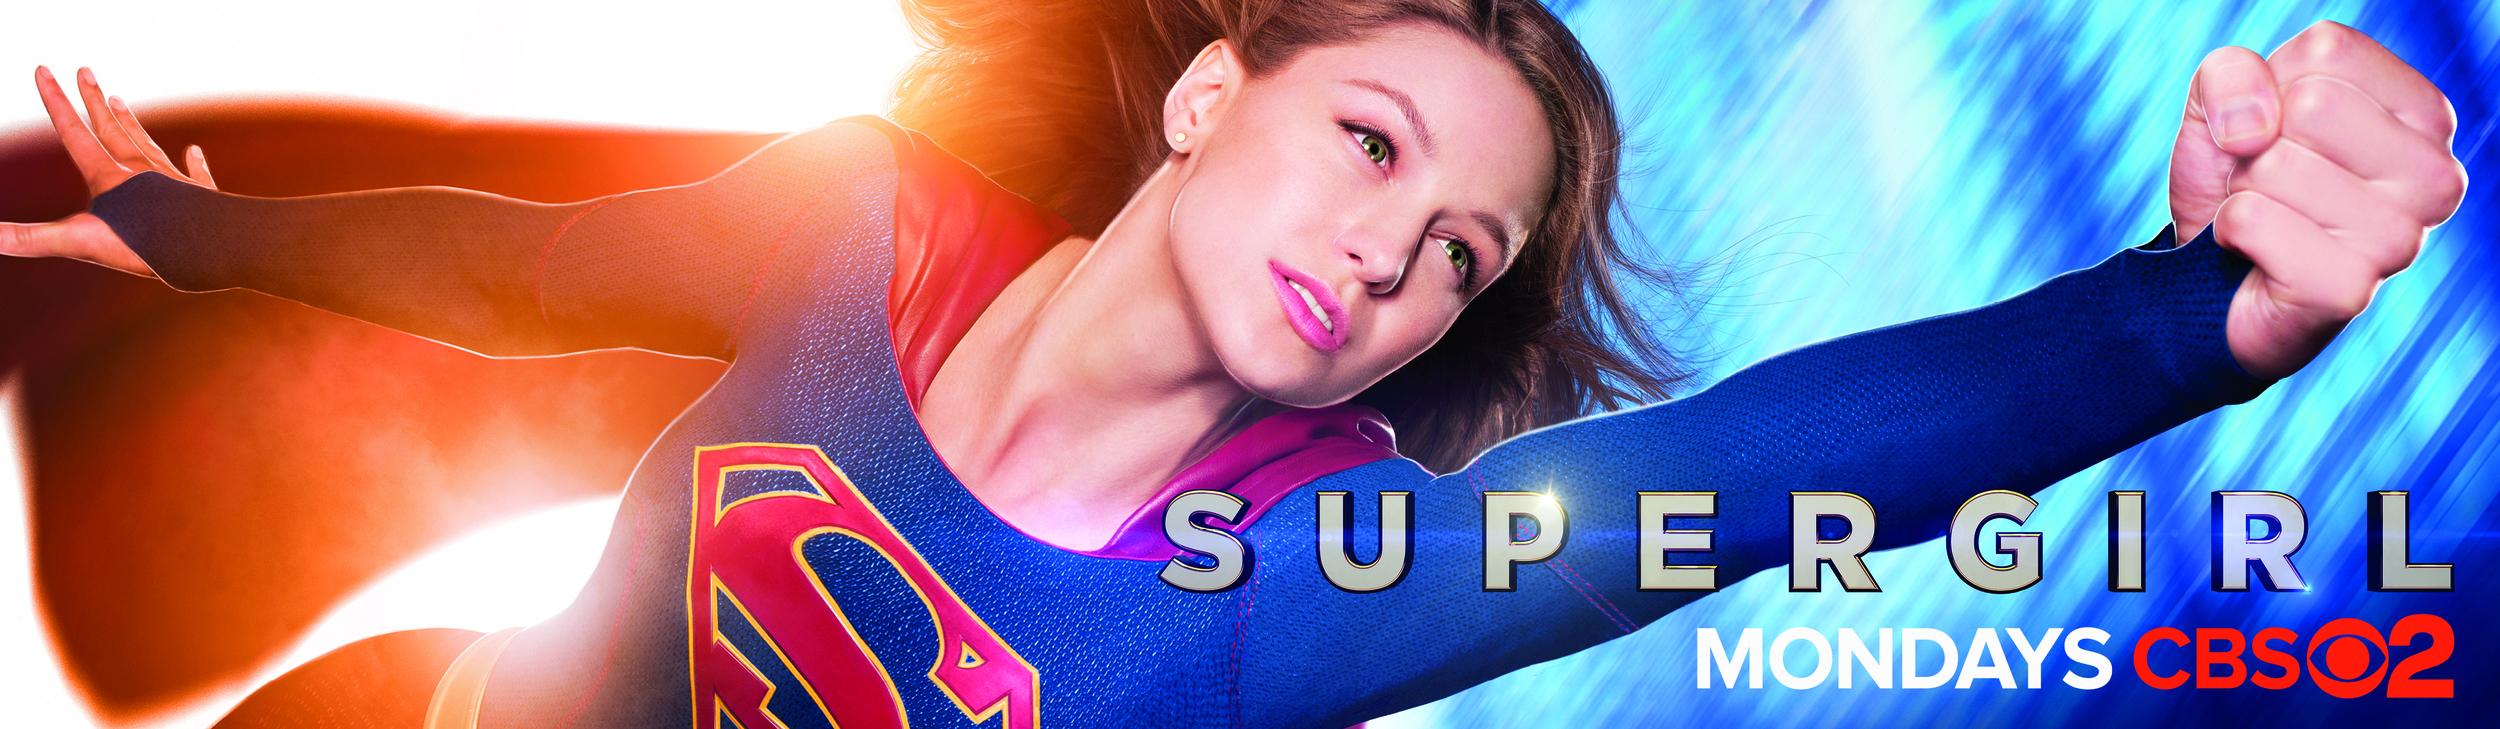 Supergirl billboard copy.jpg